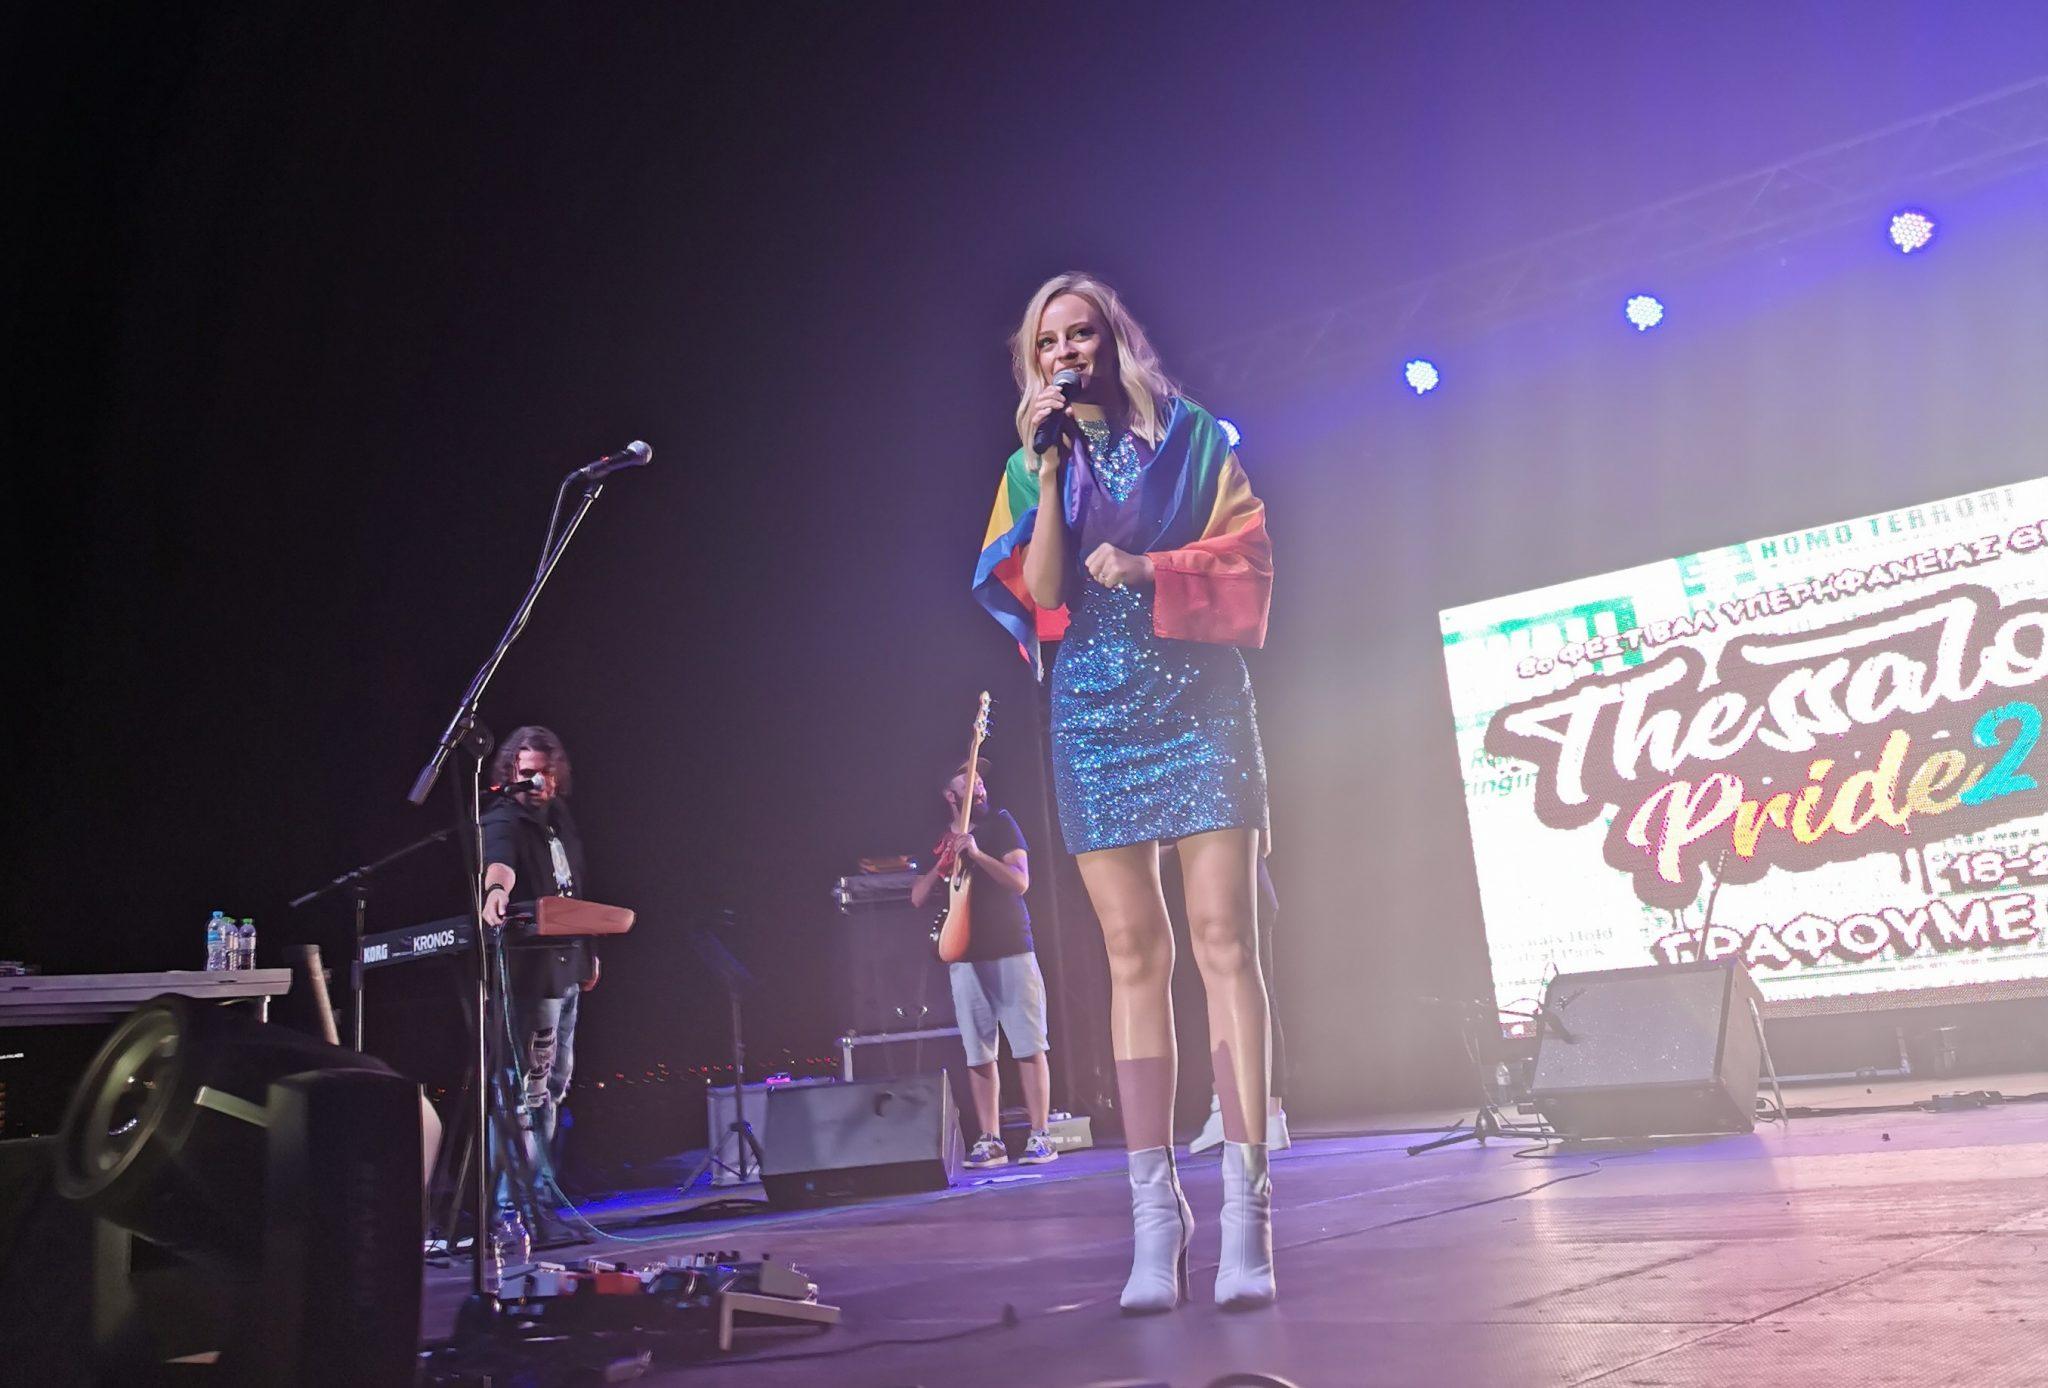 Ilenia Williams παρουσίασε και τραγούδησε στο 6ο Thessaloniki Pride